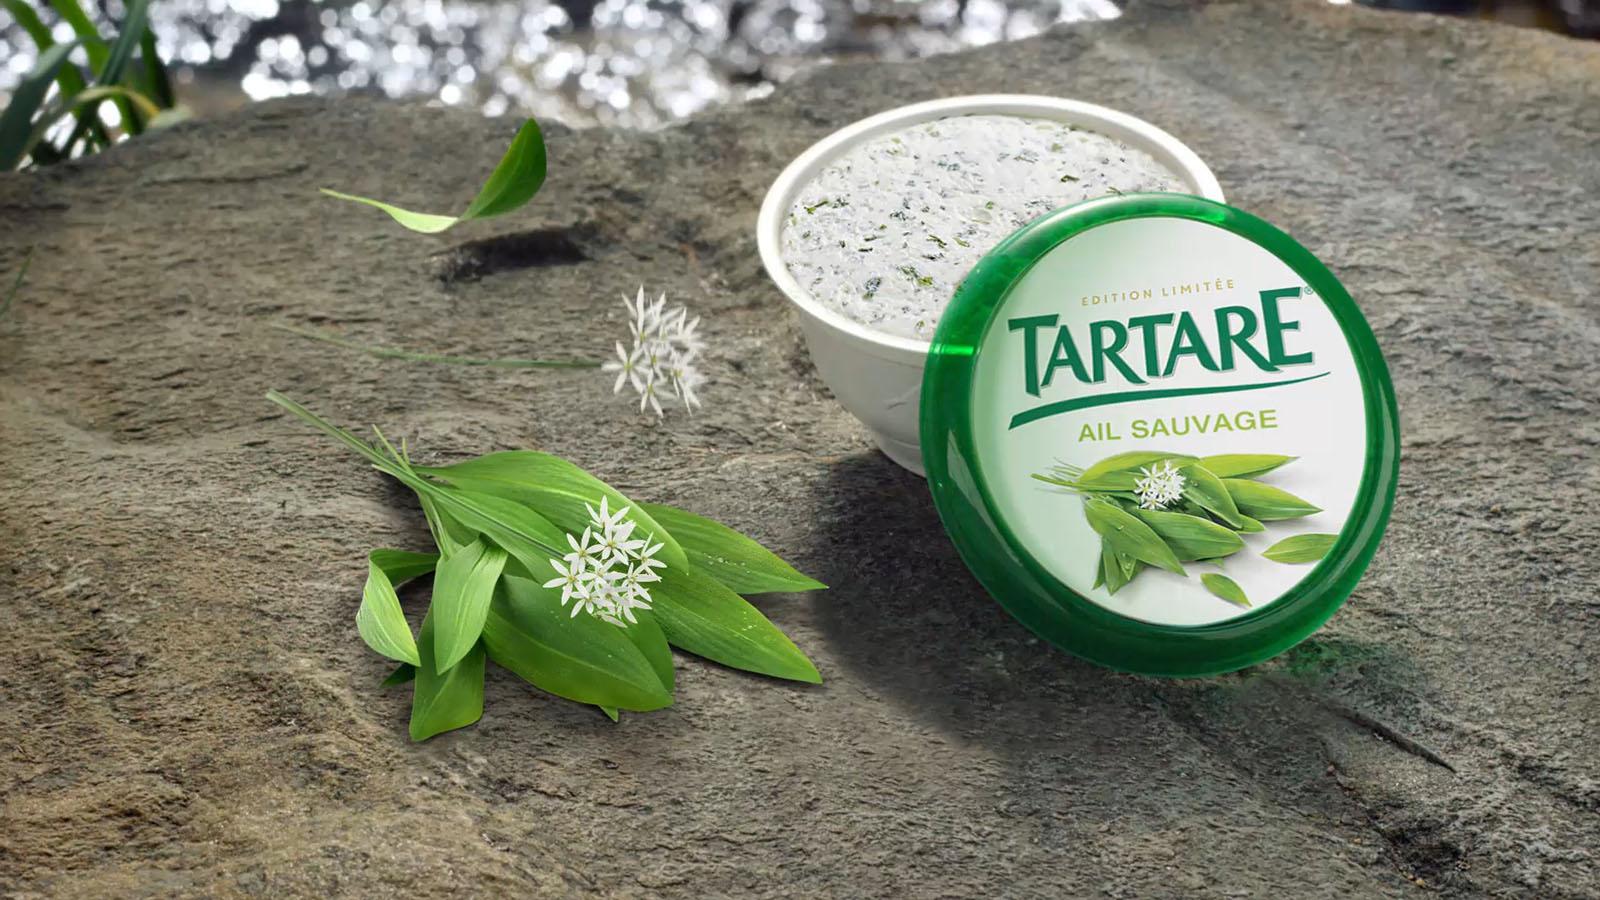 Tartare_Ail_Sauvage_packshot_3D